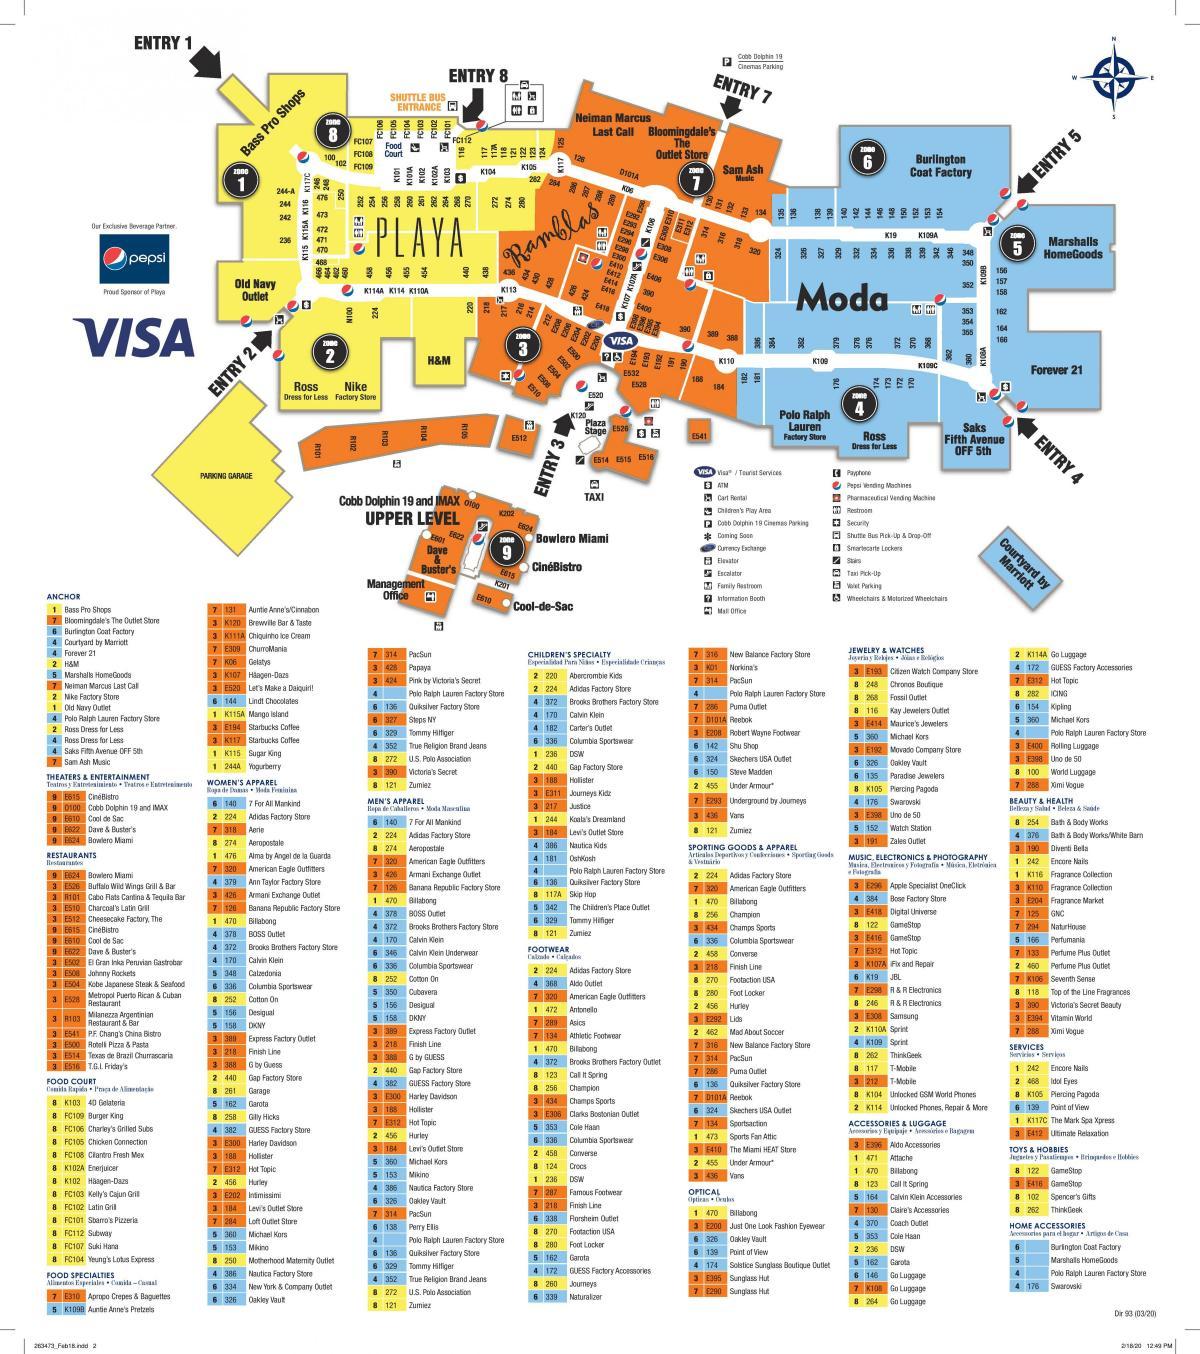 dolphin mall de miami mapa - mapa de dolphin mall de miami